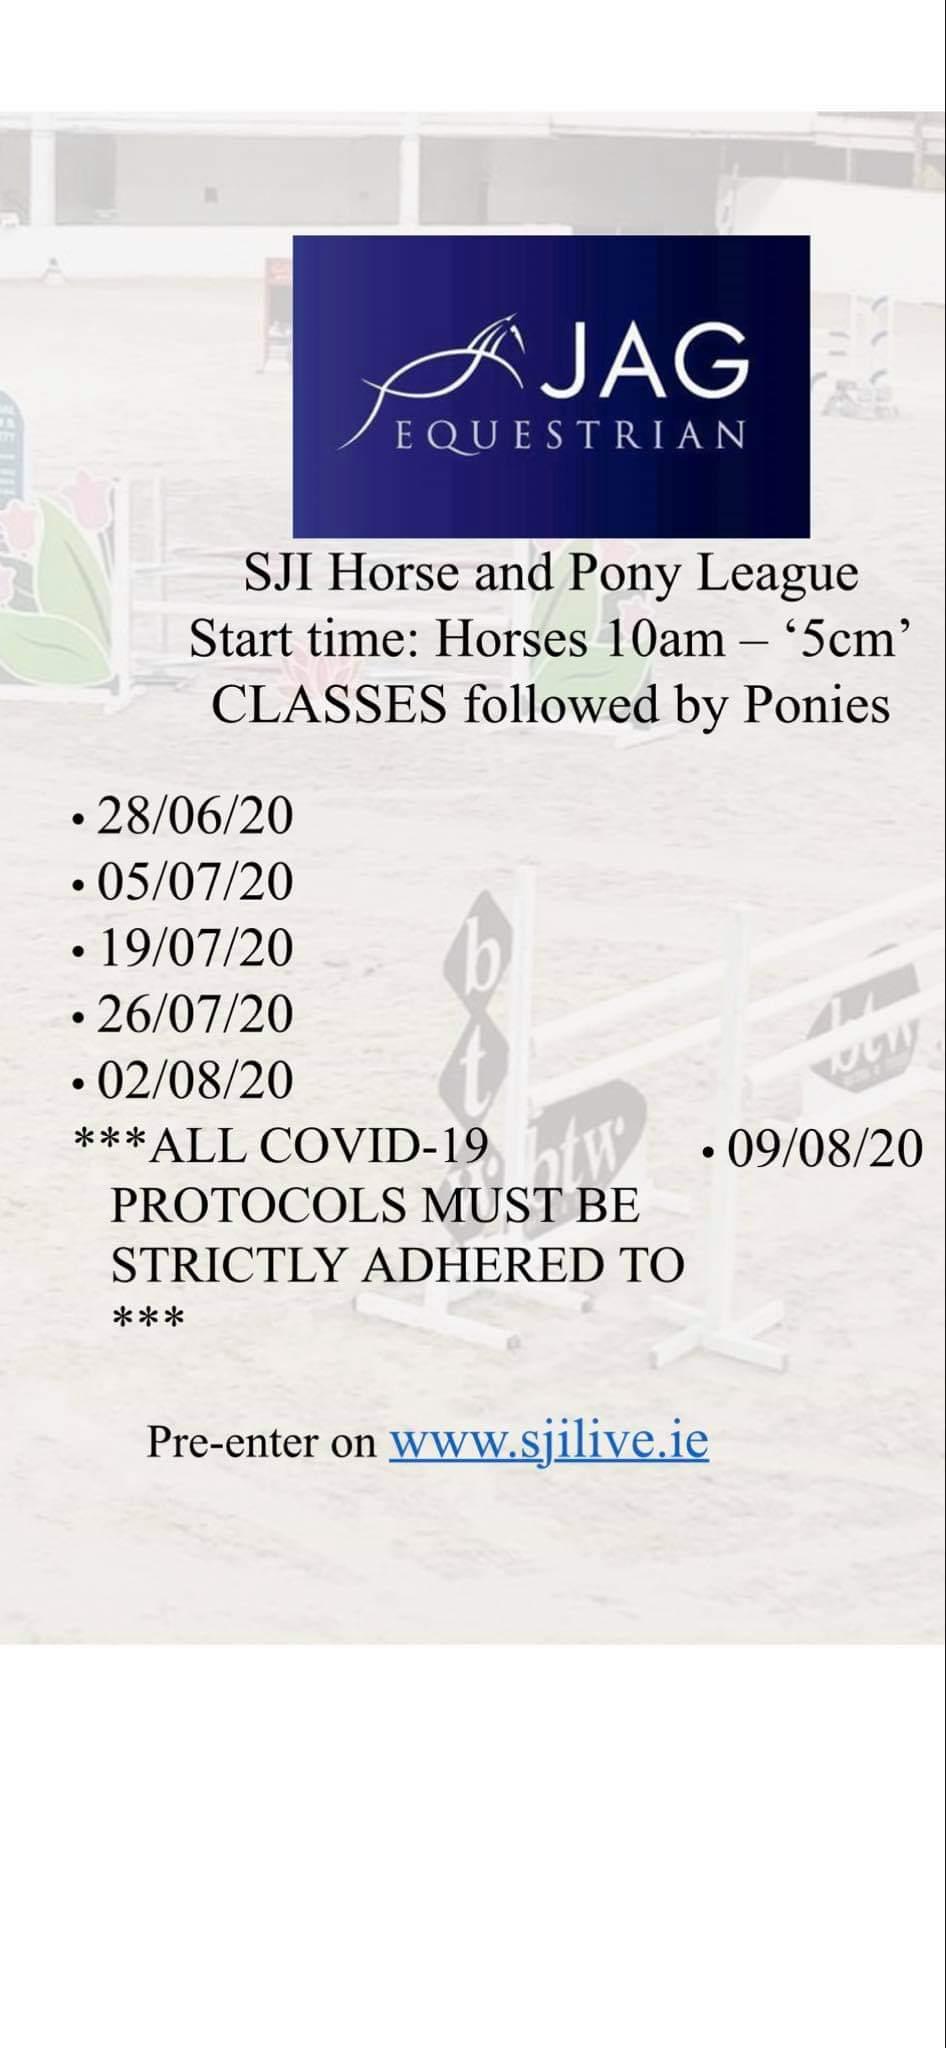 SJI HORSE & PONY LEAGUE